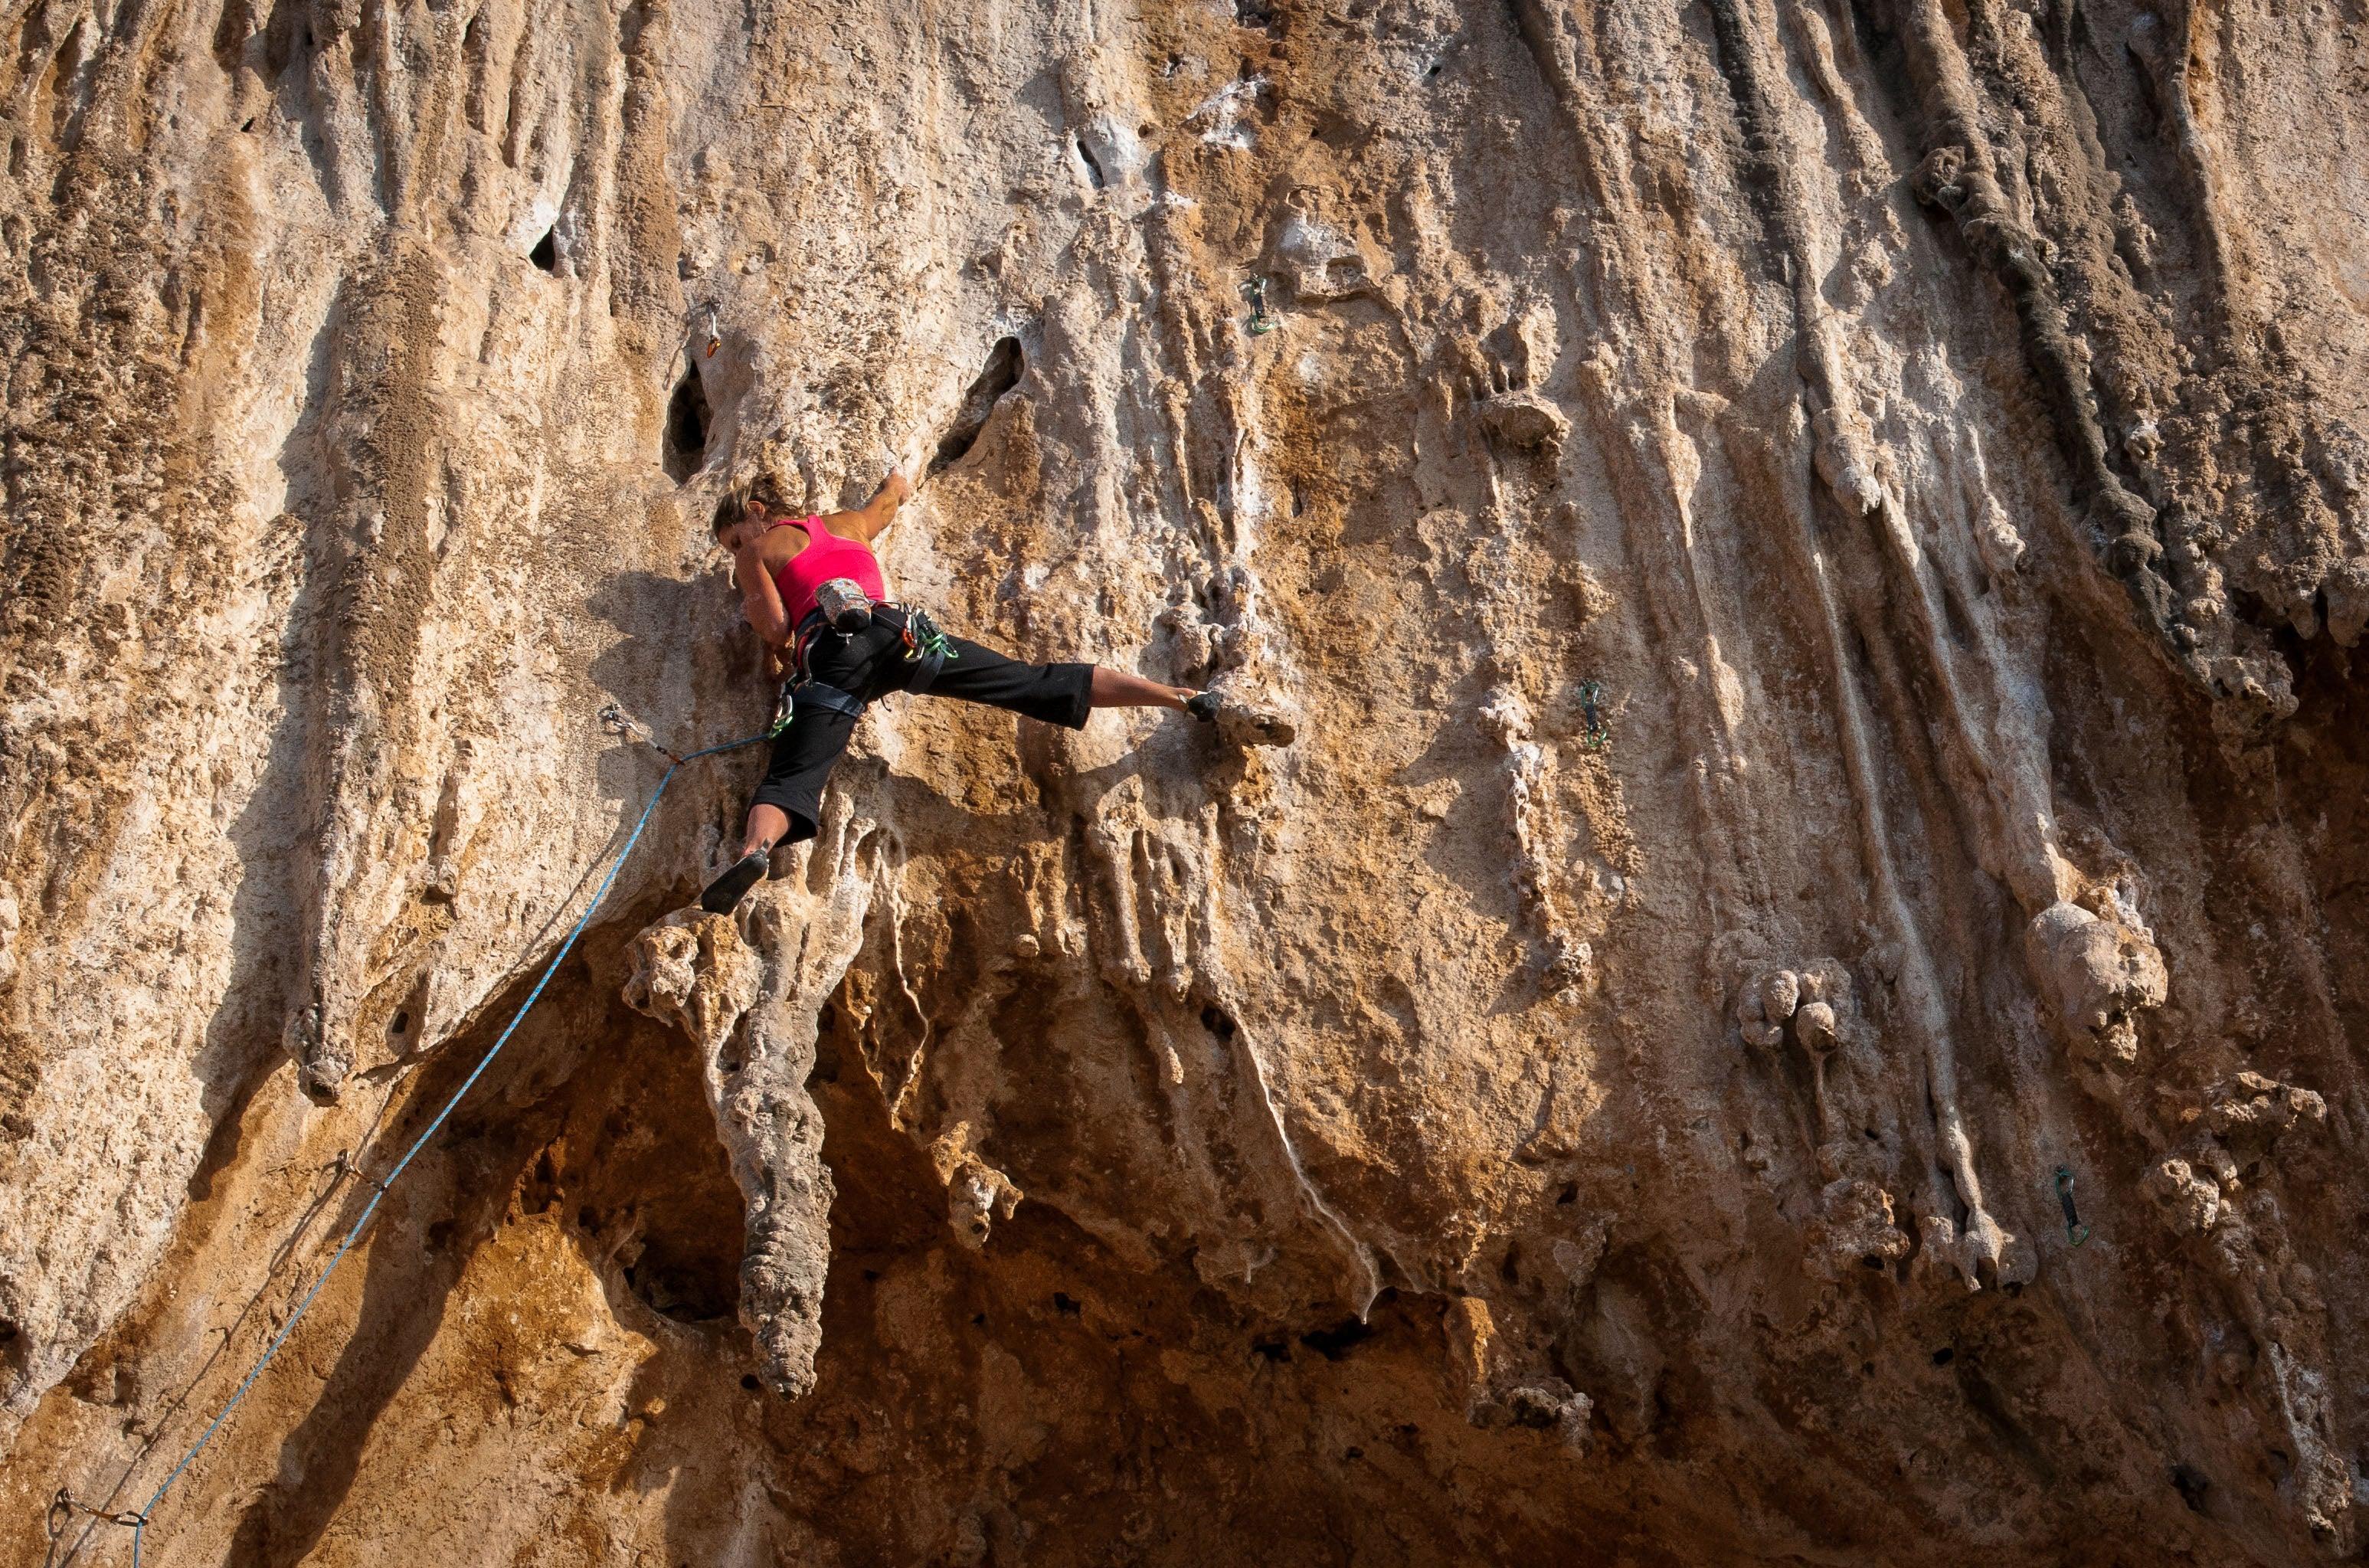 Five Questions With Mountain Guide Lilla Molnar